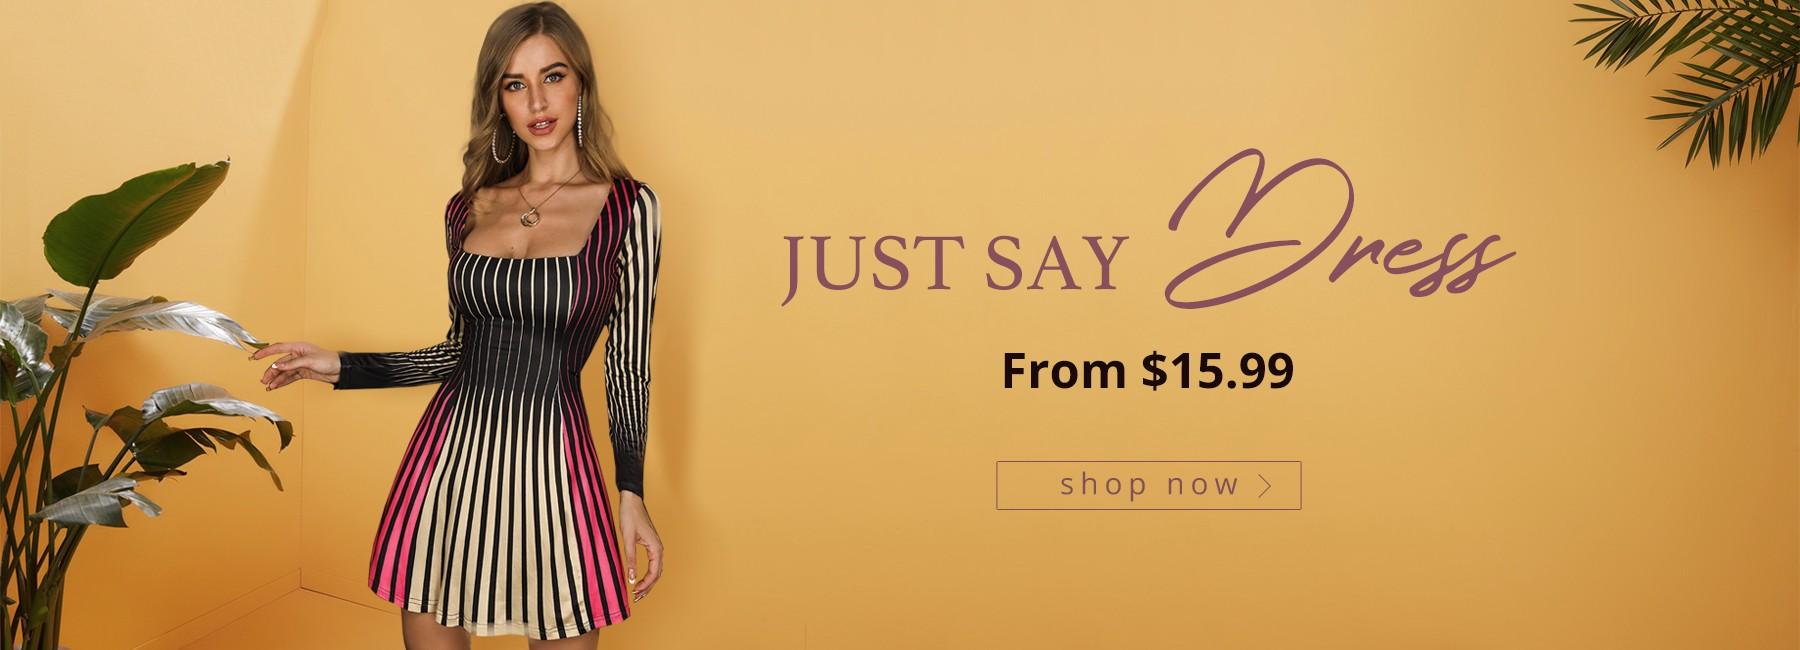 494ffccbb13 IVRose  Women s Fashion Online Shopping